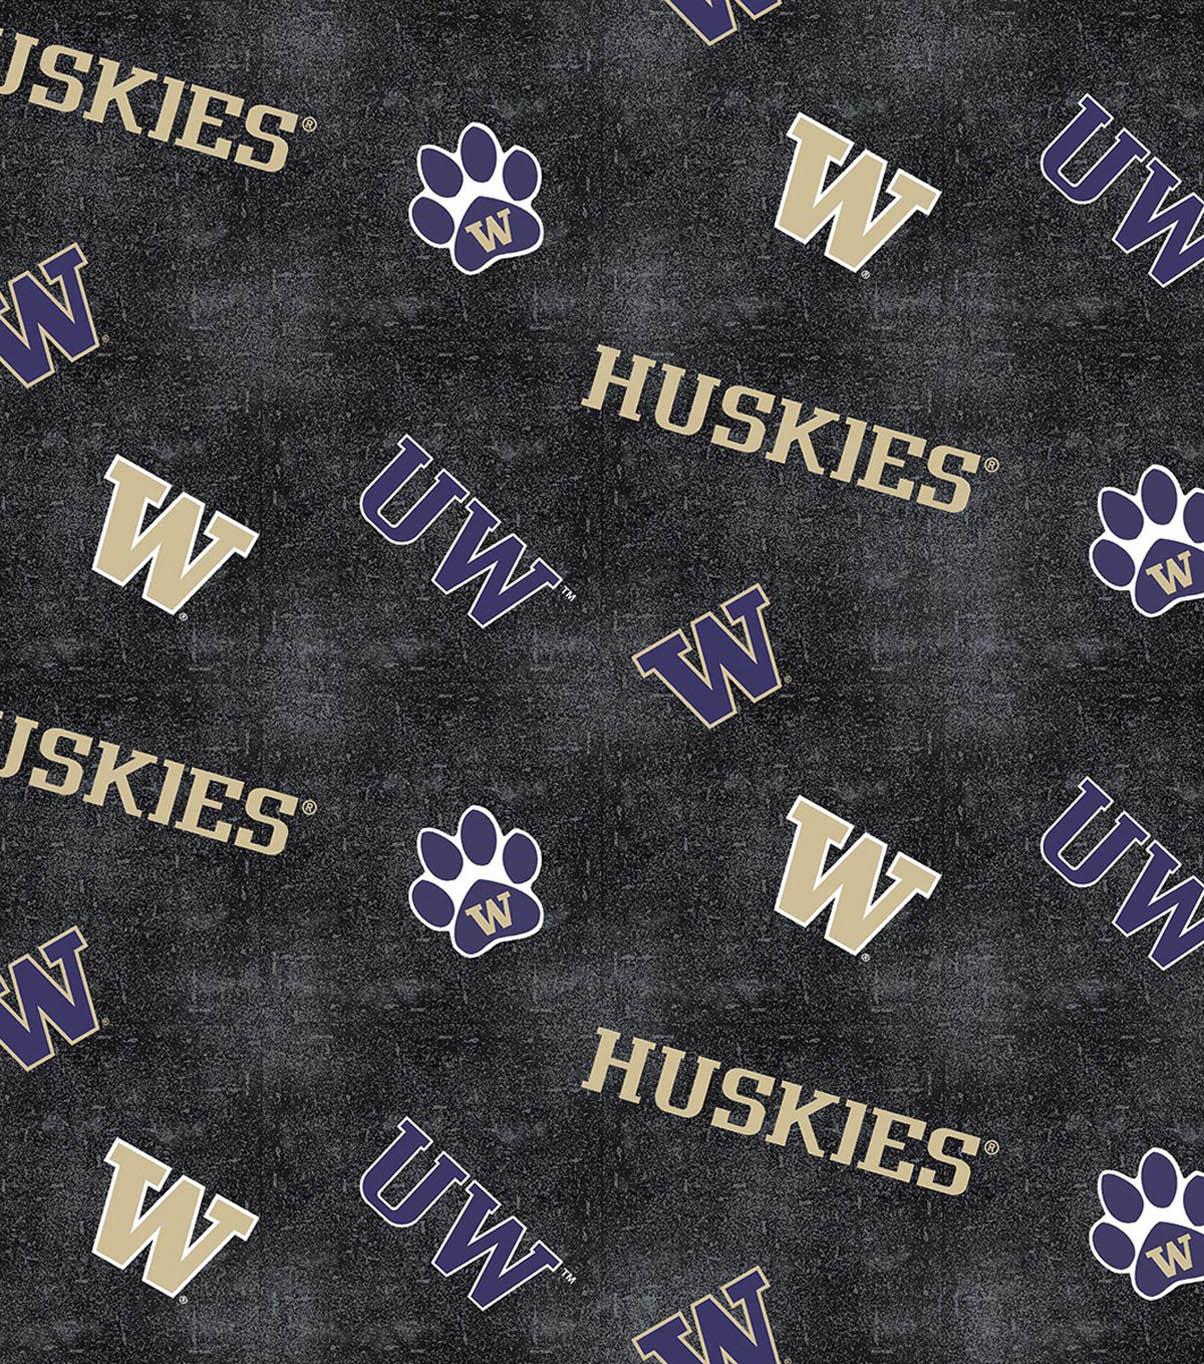 University Of Washington Huskies >> University Of Washington Huskies Flannel Fabric 42 Distressed Logo